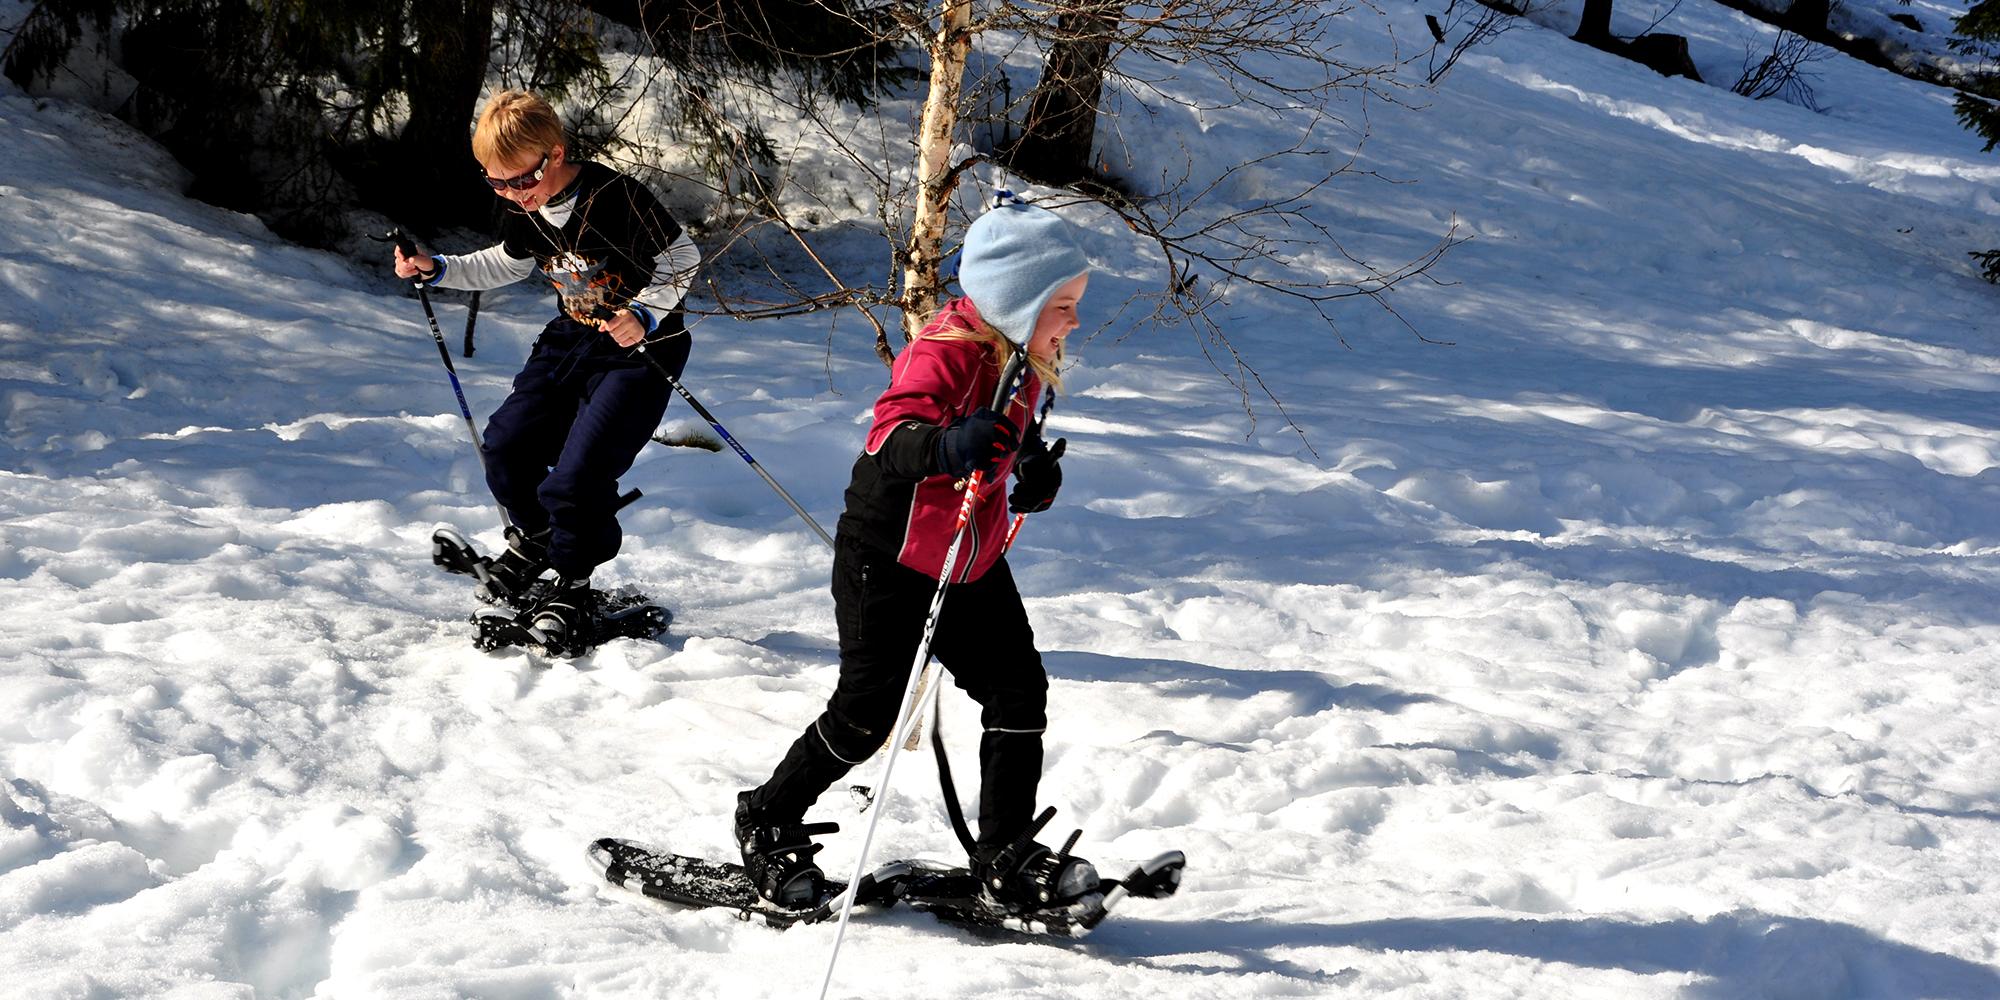 Mokk farm - 2 kids snow shoeing. Copyright: Mokk gård